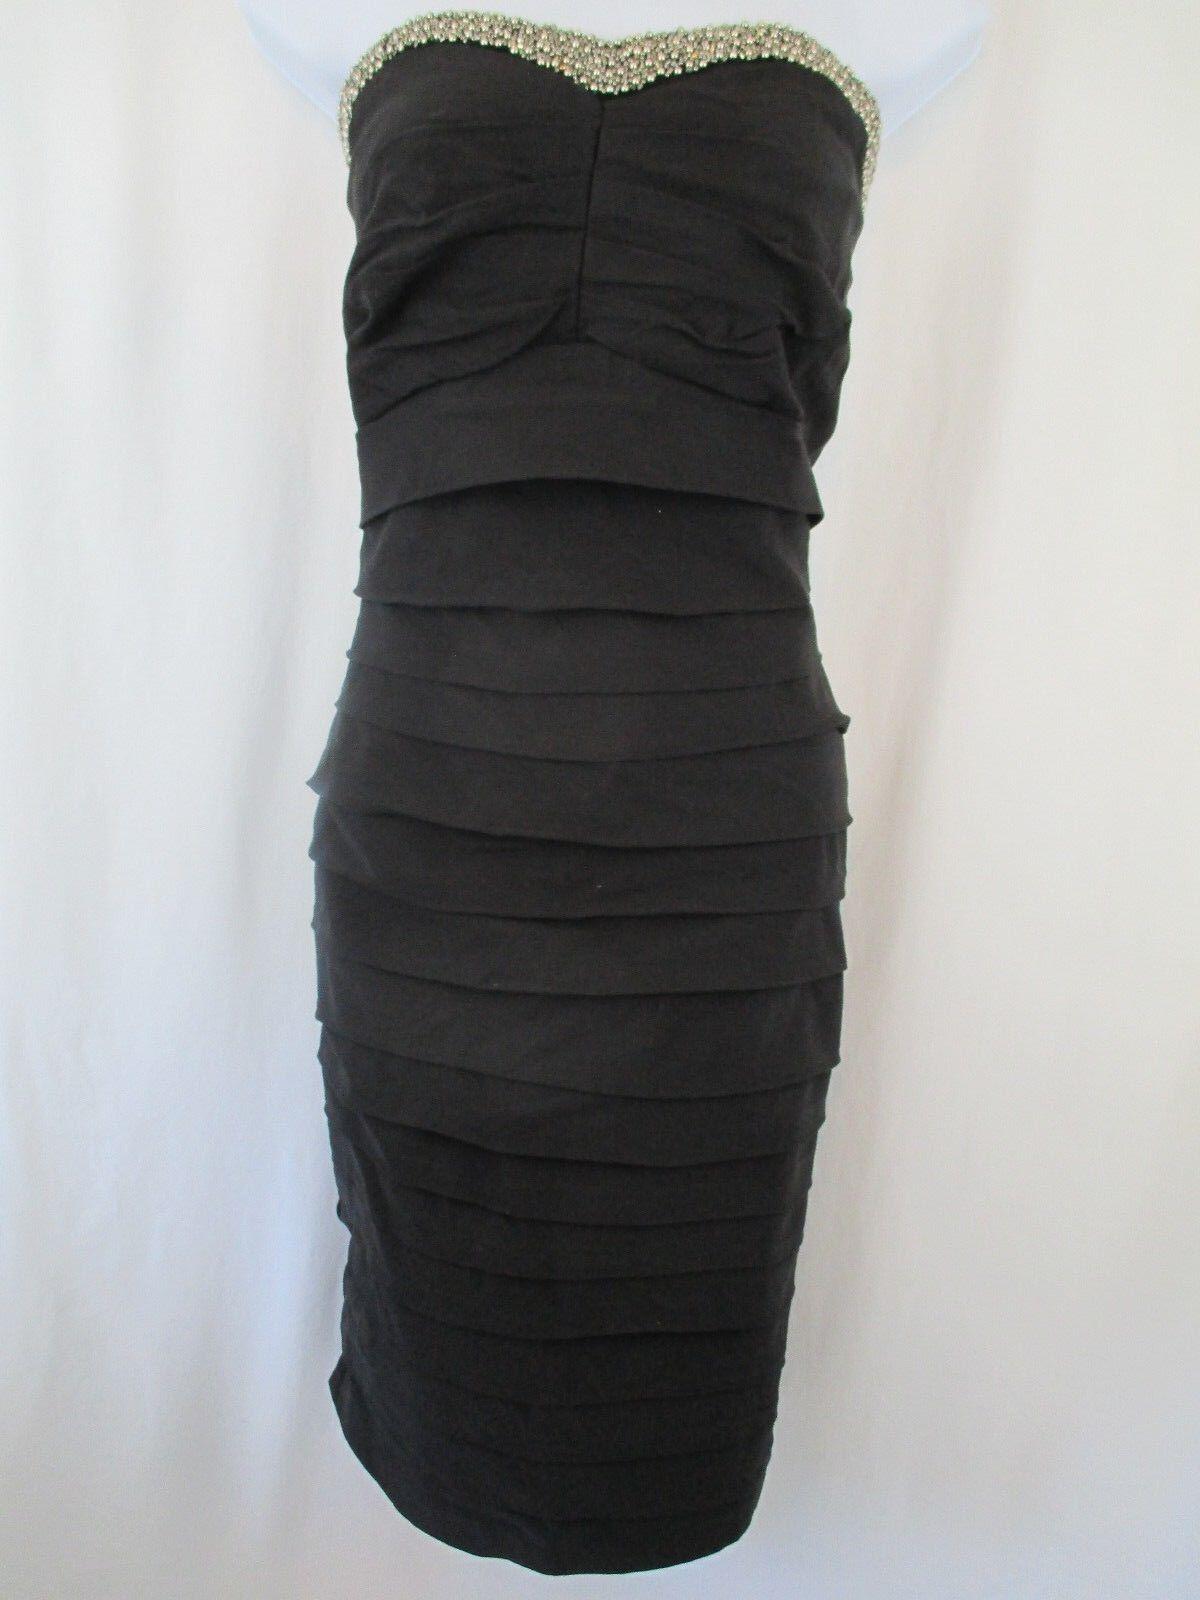 566aa72de42 Torrid Mini Stretch Dress Evening Formal Tube Black Strapless Plus ...